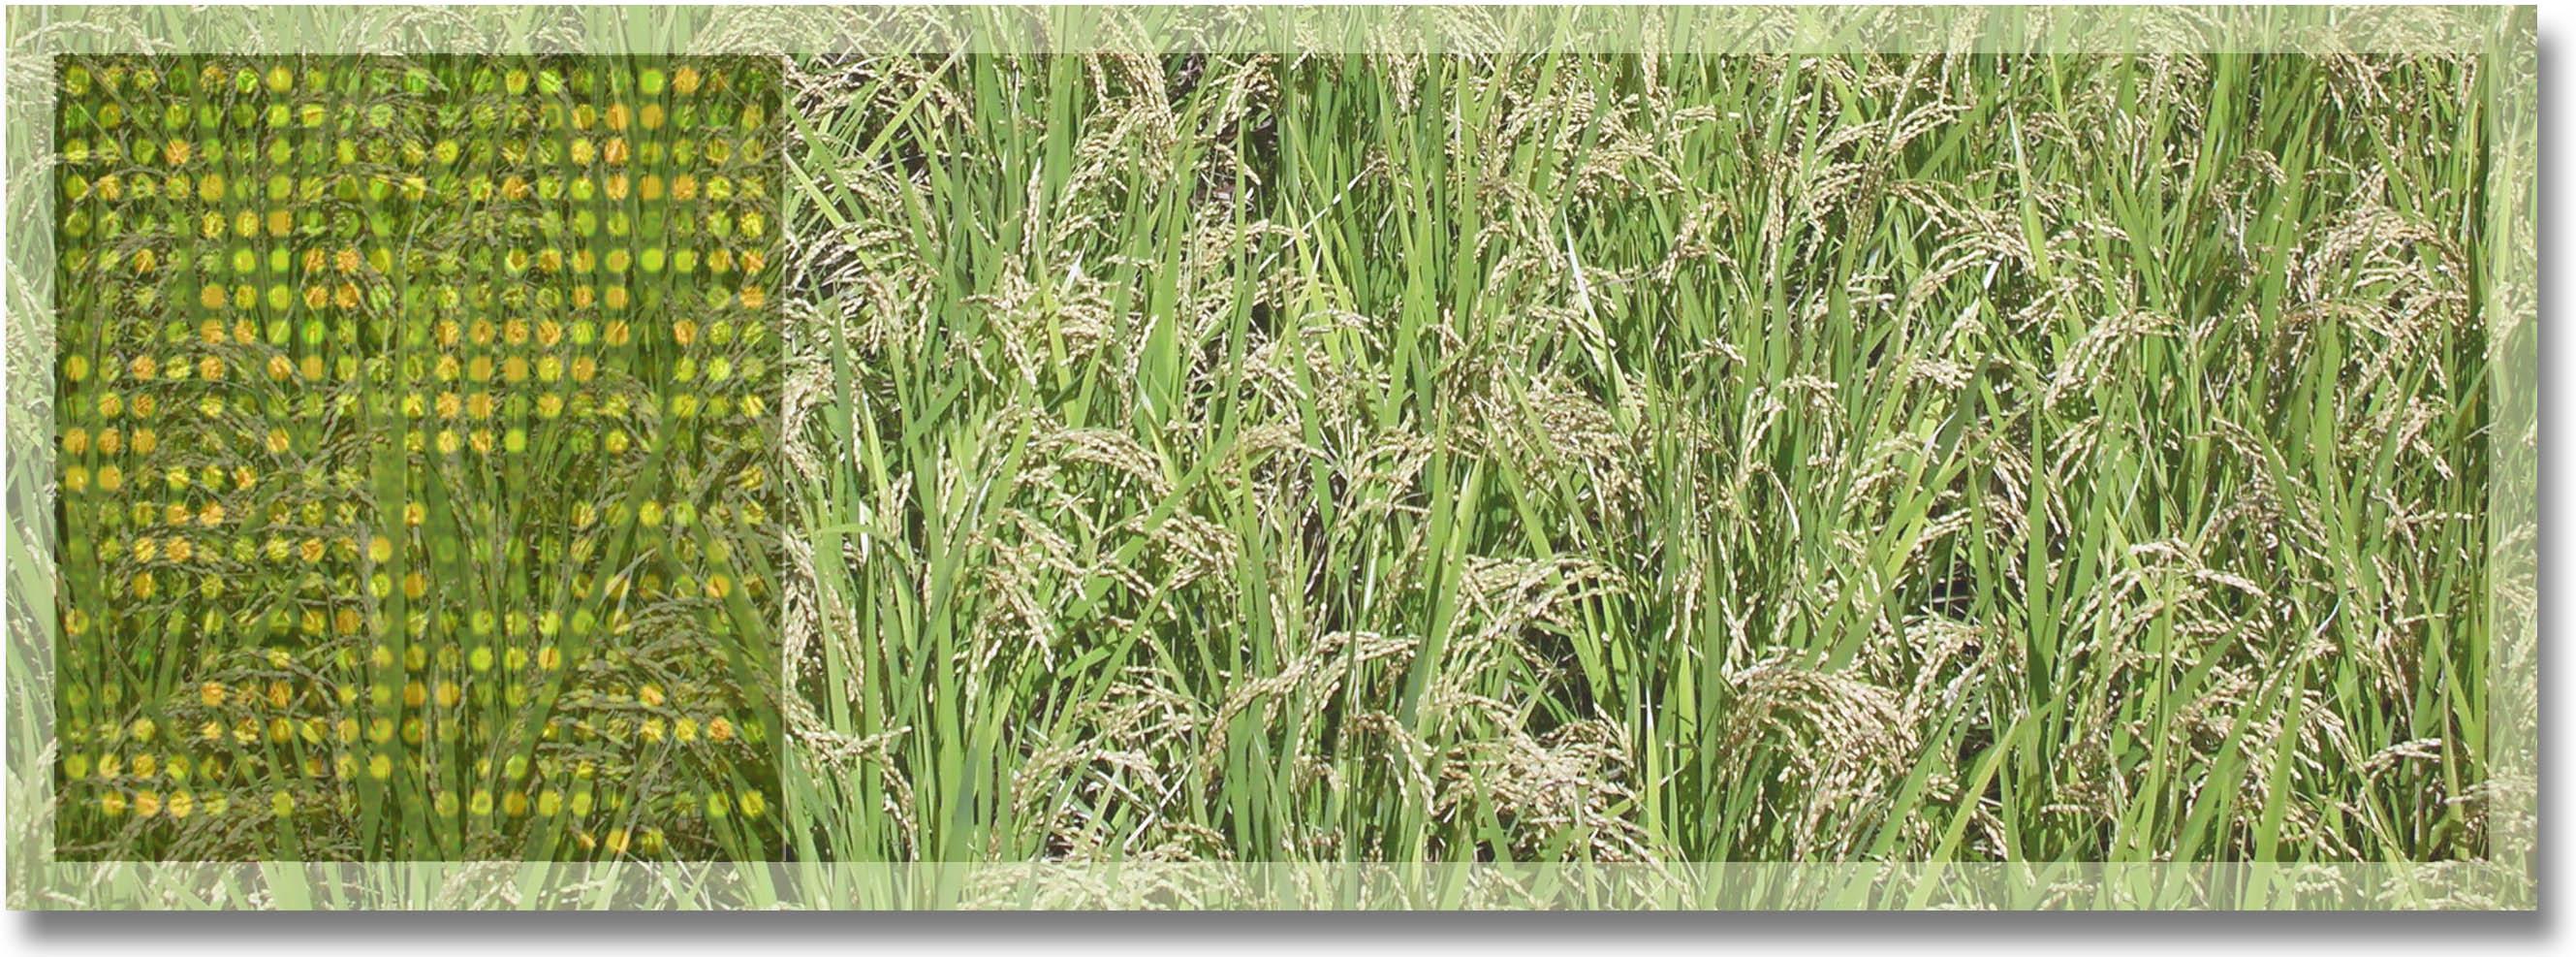 http://www.ige.tohoku.ac.jp/prg/genetics/study_report/upload_items/201110/rice-field3.jpg